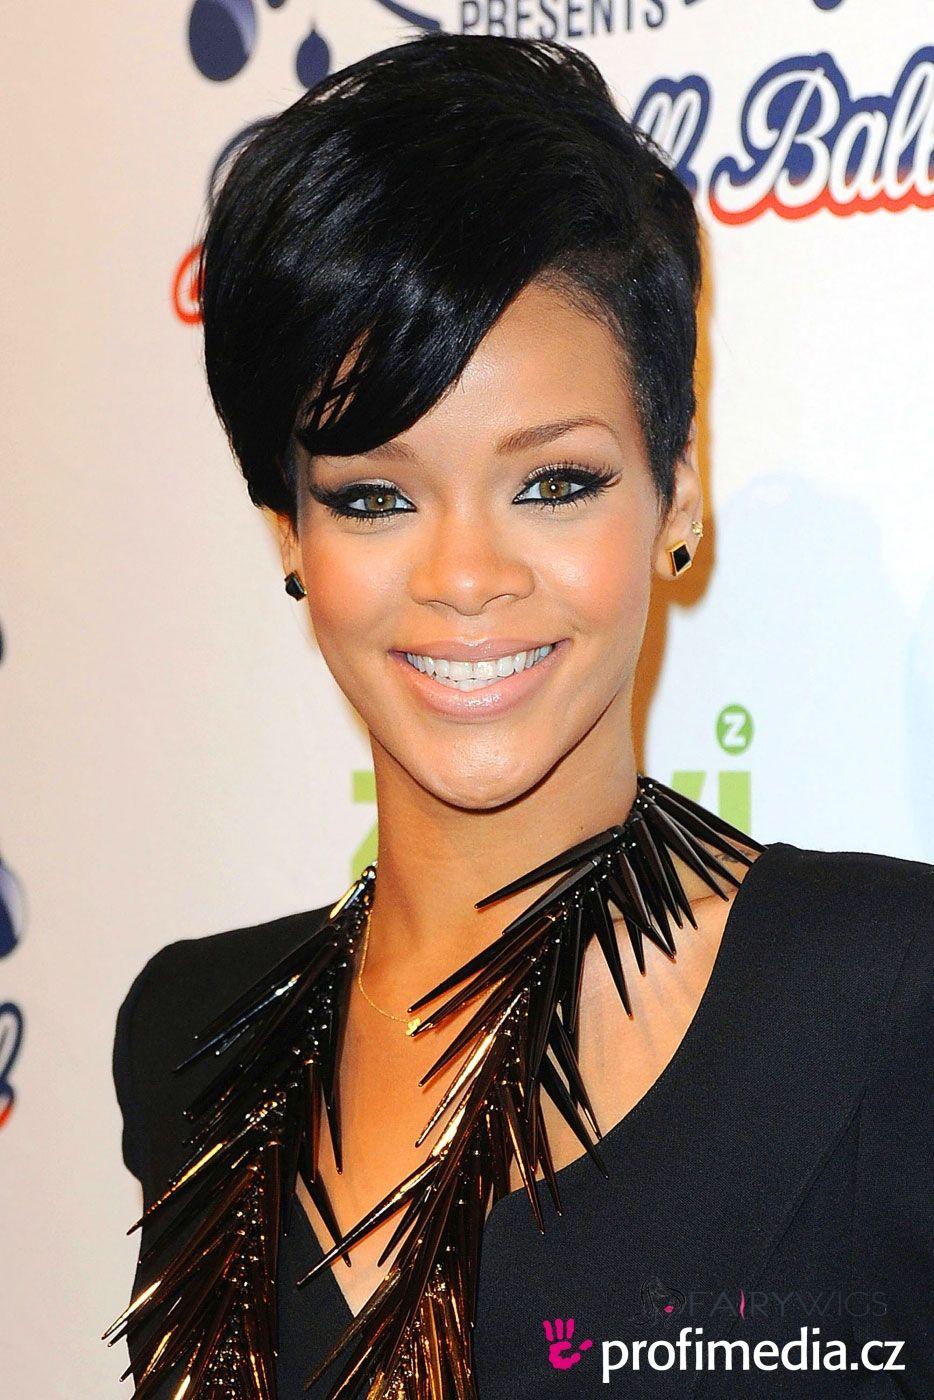 Stunning Short Black Female Celebrity Hairstyle Fairywigs